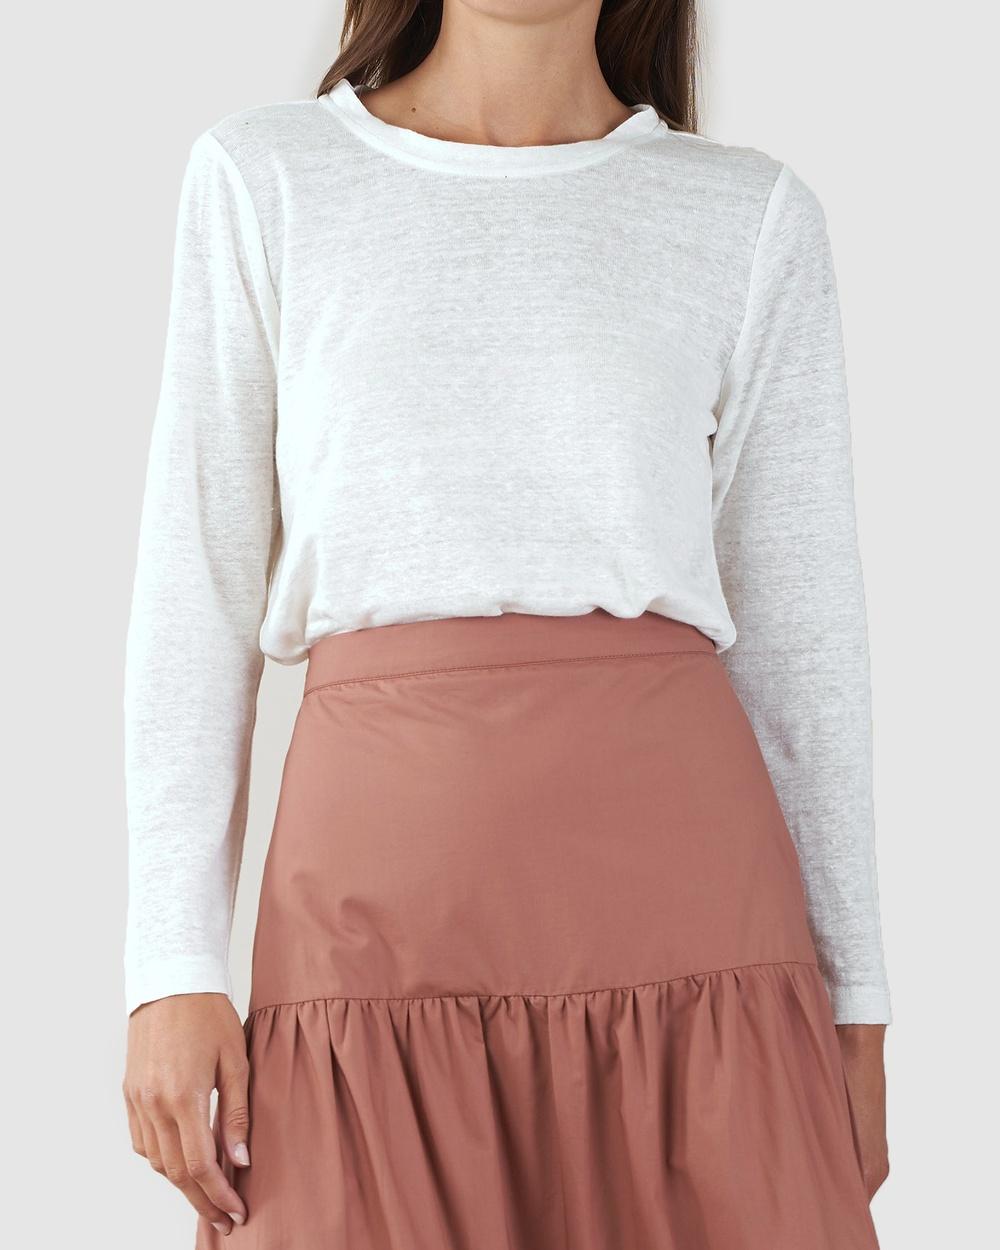 Amelius - Priya Long Sleeve Linen T Shirt - Long Sleeve T-Shirts (Ivory) Priya Long Sleeve Linen T-Shirt